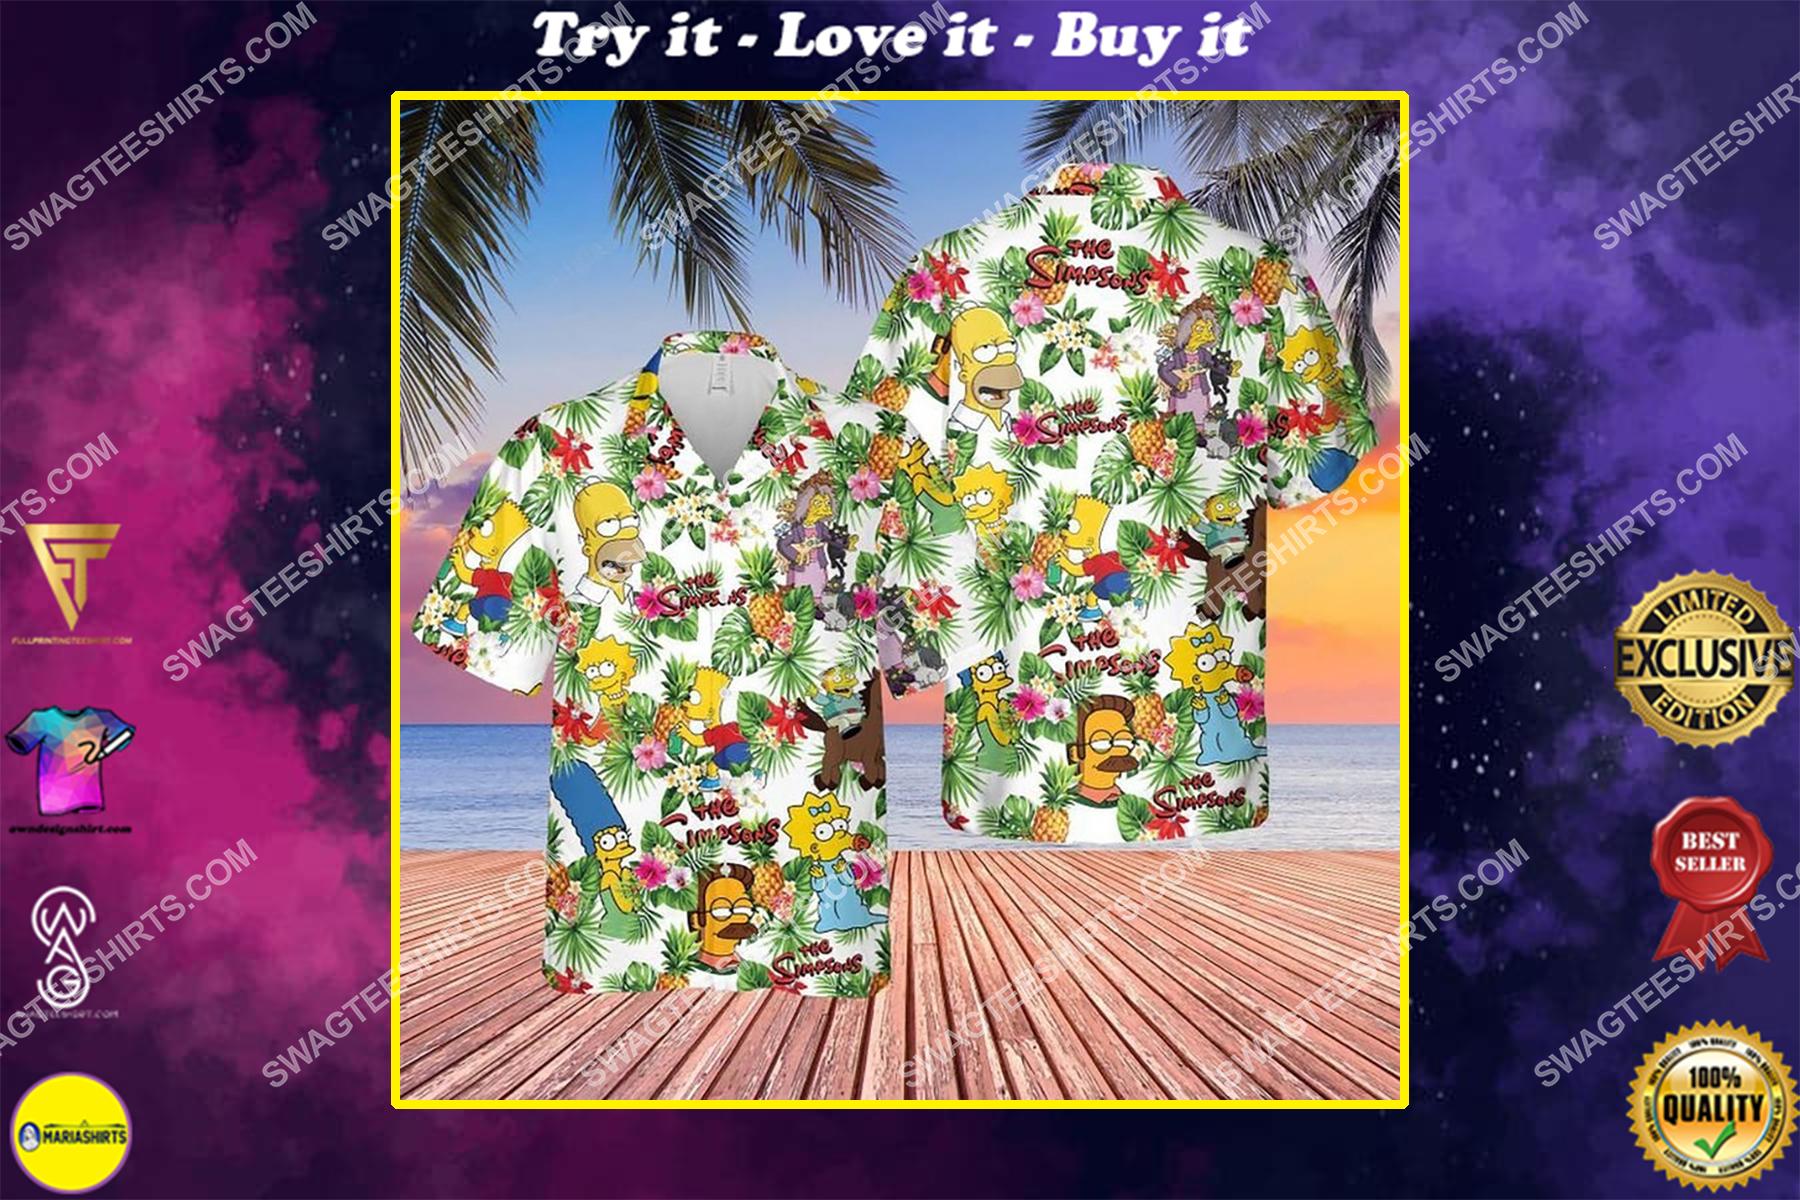 The simpsons tv show summer vacation hawaiian shirt